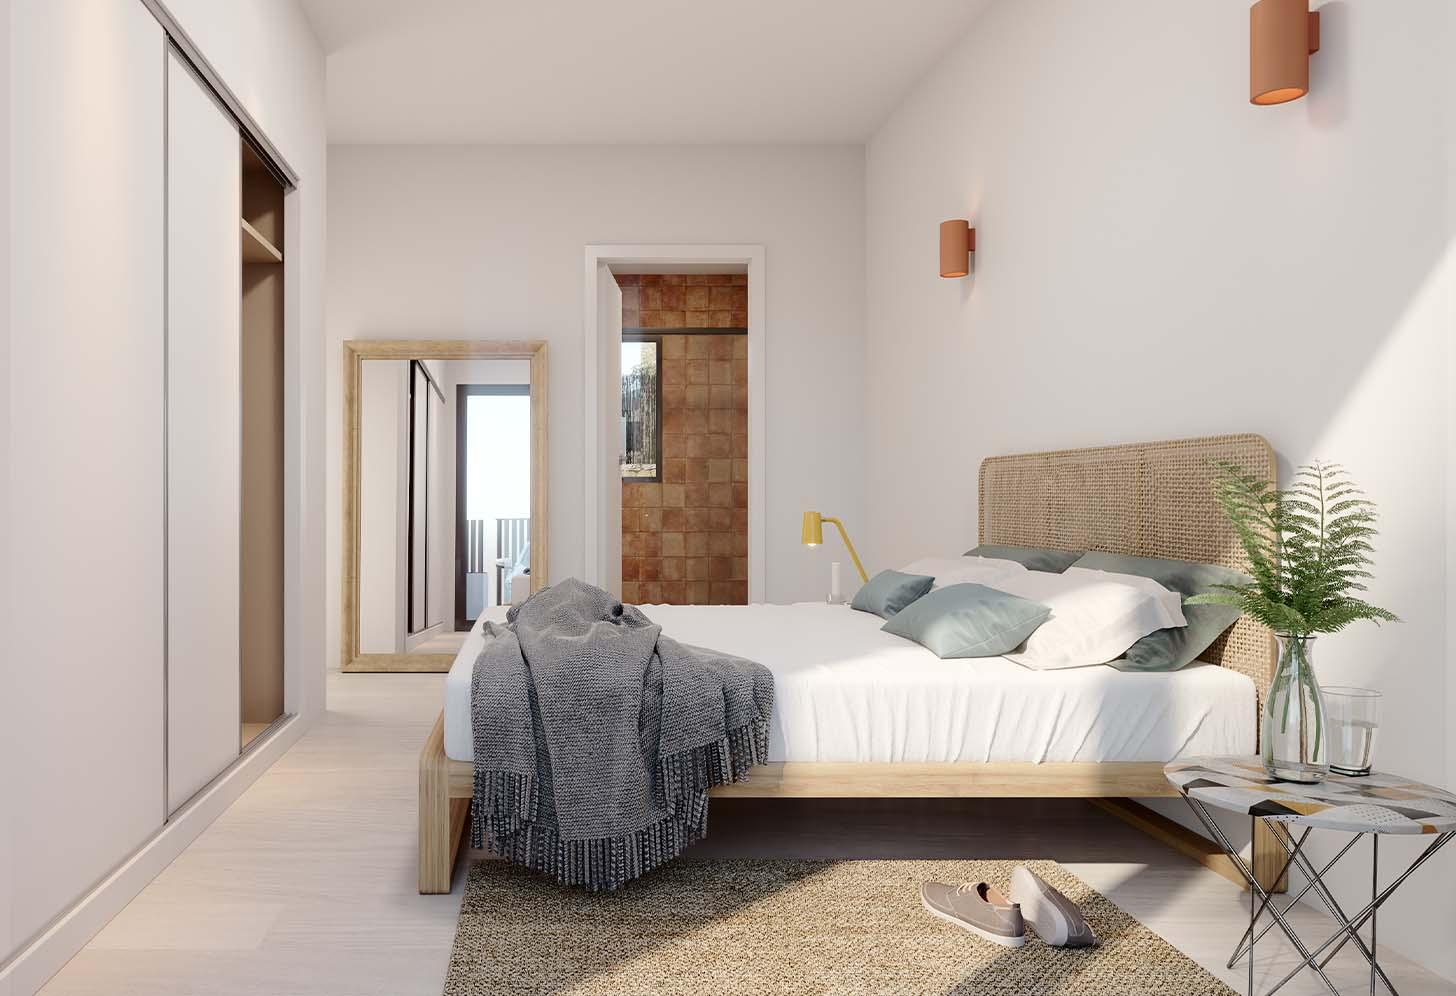 immobilier neuf espagne costa blanca on-o2 balcon finestrat chambre